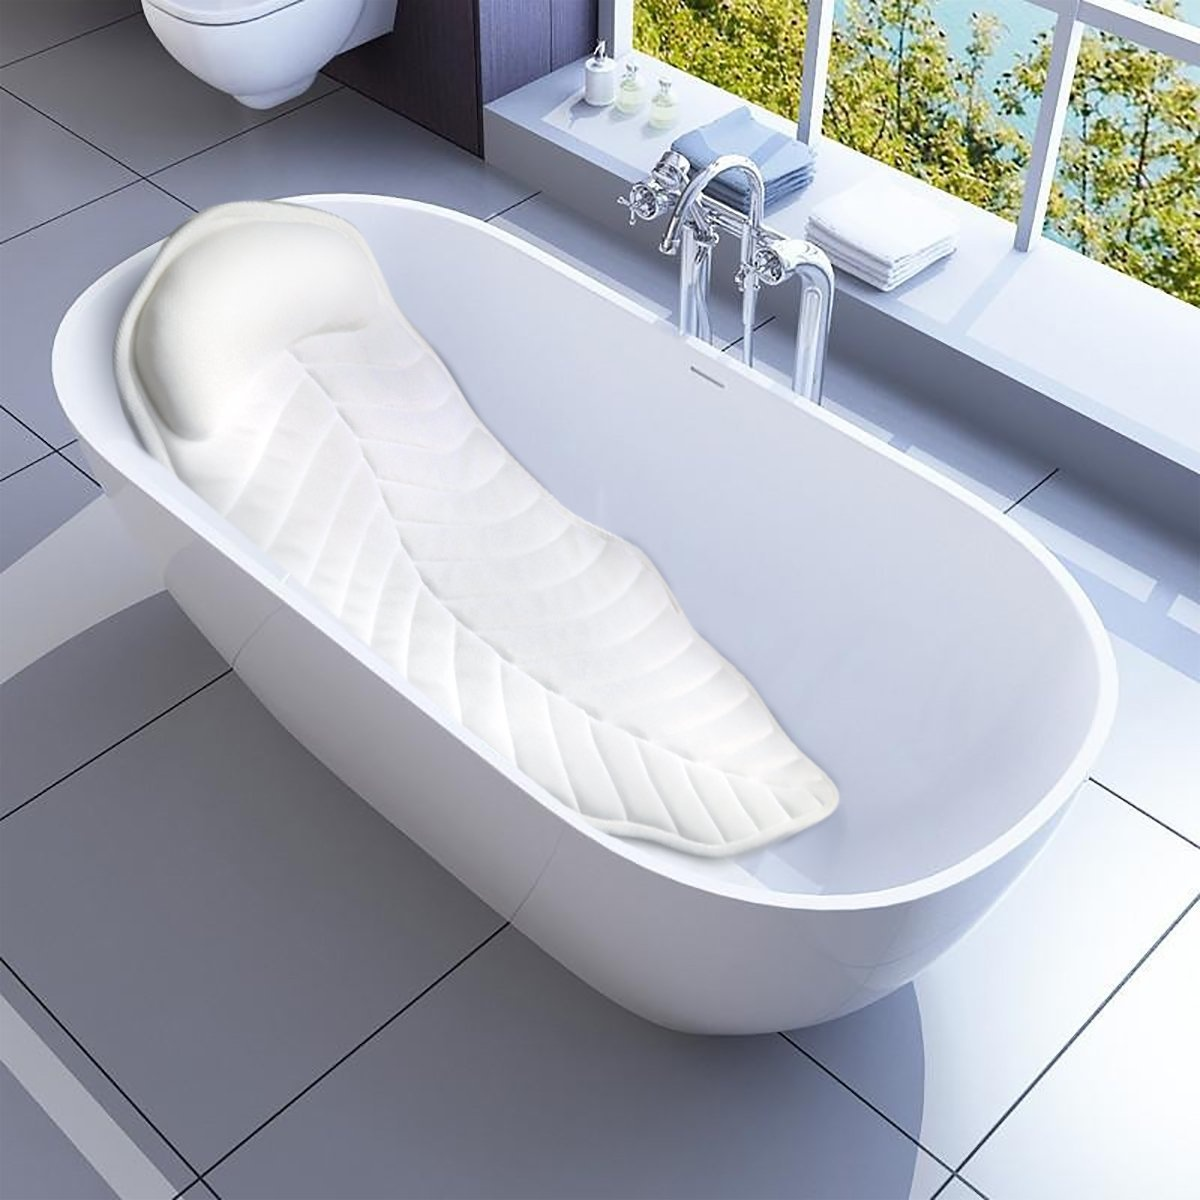 Full Body Spa Bath Pillow Mat, Non-Slip Bathtub Mattress Luxury ...